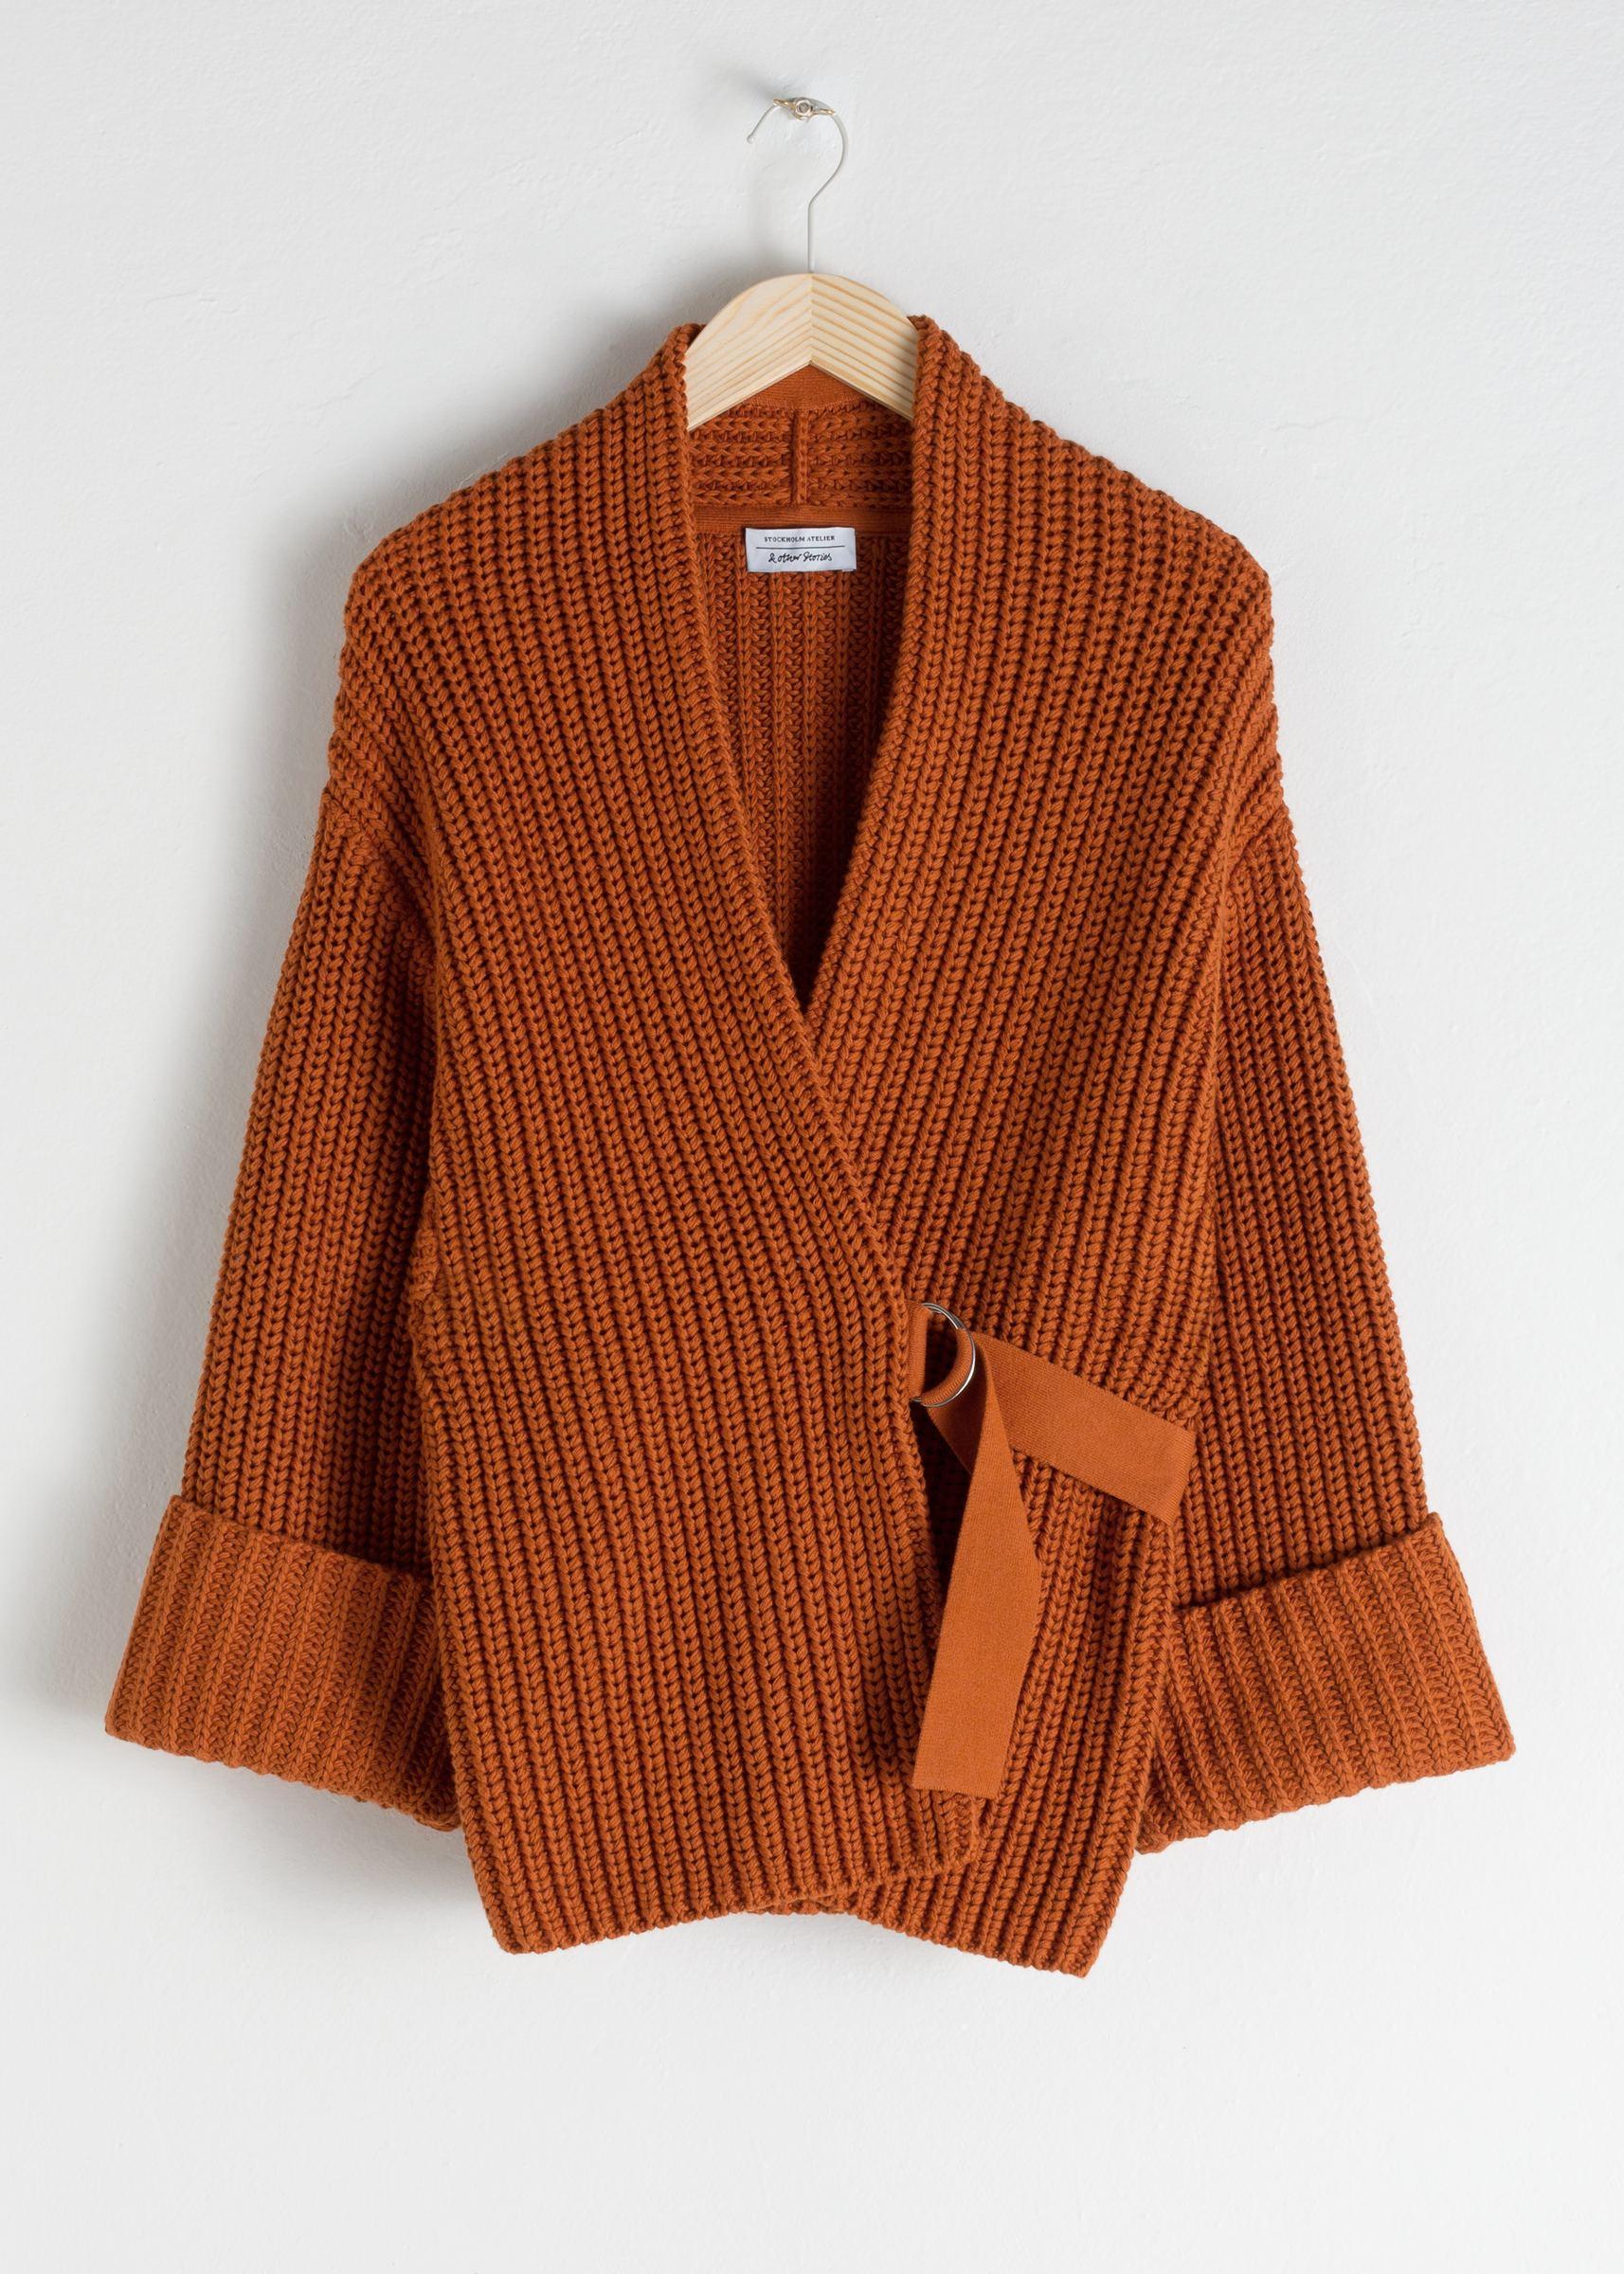 Damkläder Online | Shoppa Kläder & Märkeskläder | Afound